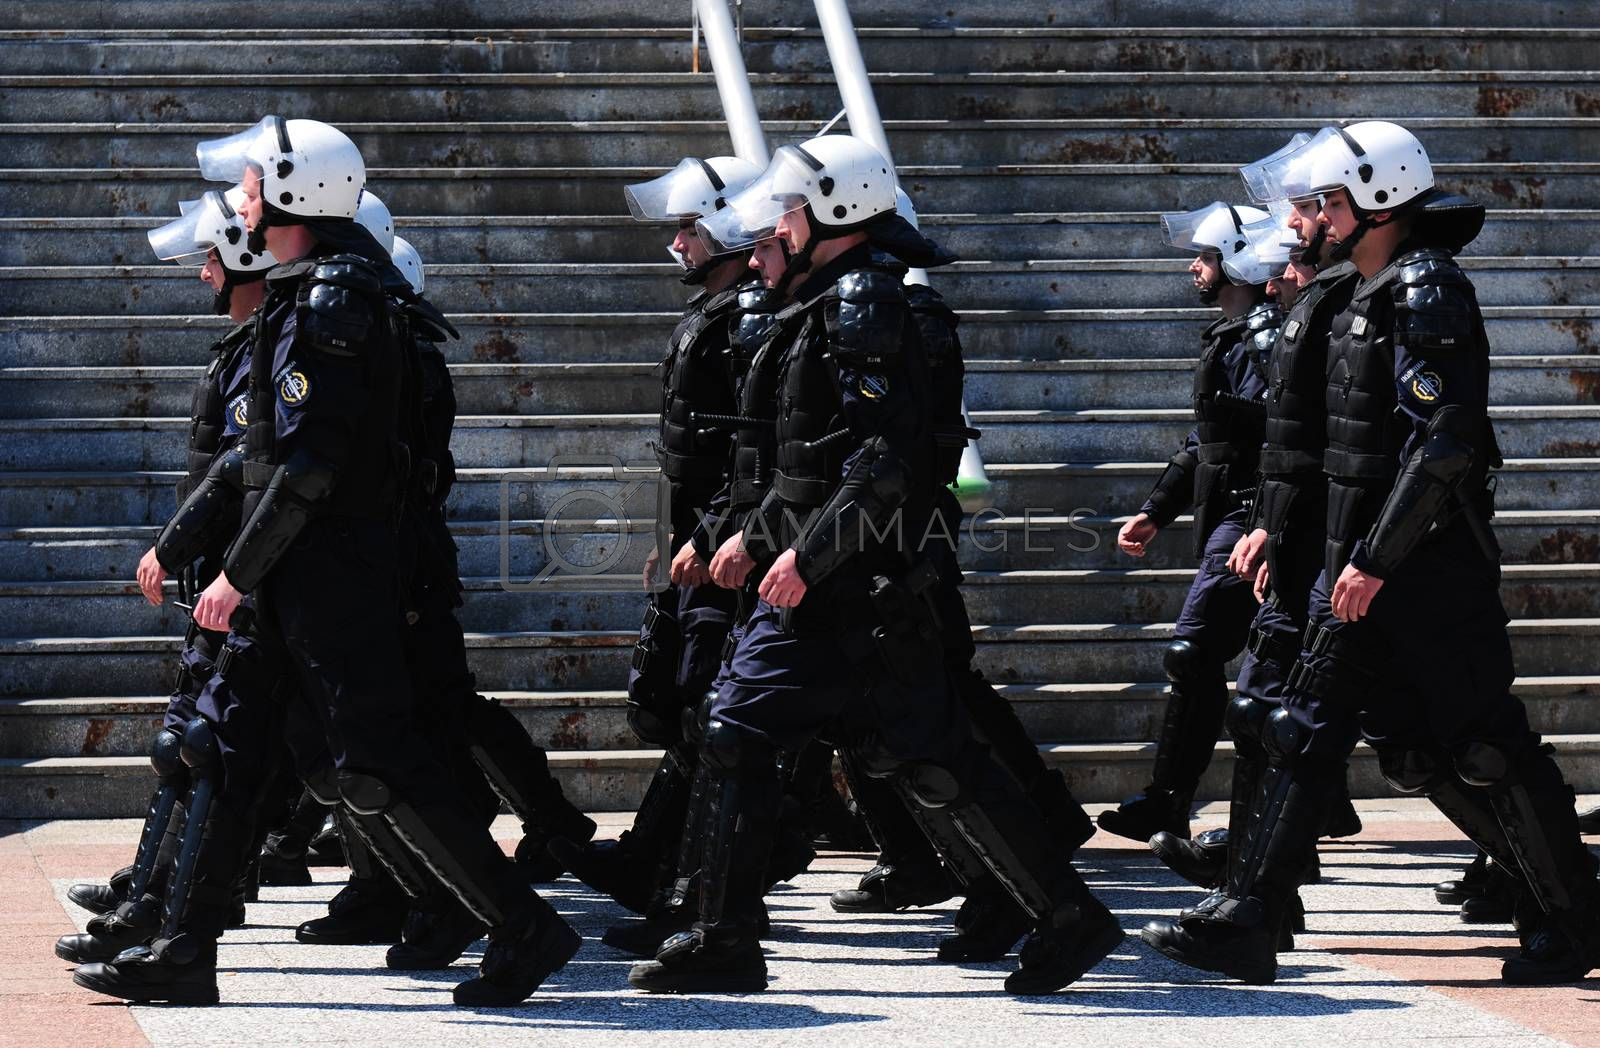 SERBIA, BELGRADE - APRIL 29, 2012: Soldiers of the Serbian police (MUP) elite units, the Gendarmerie, standing in line marking Gendarmerie day